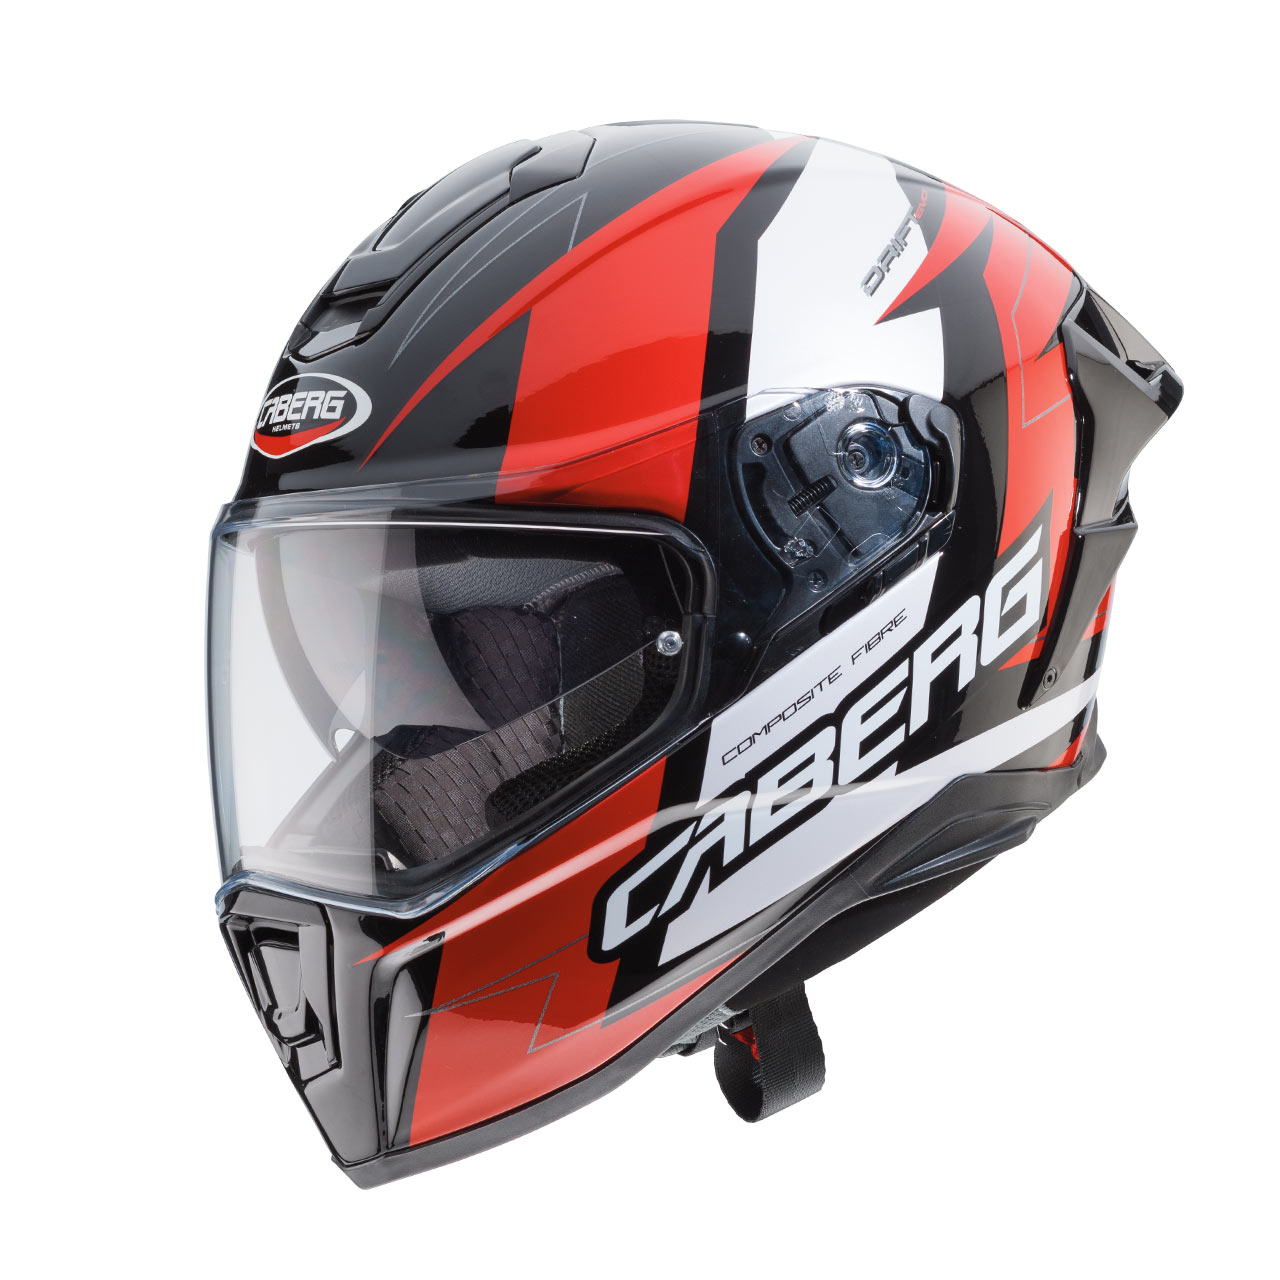 Caberg Drift Evo Speedster - Red/ Black